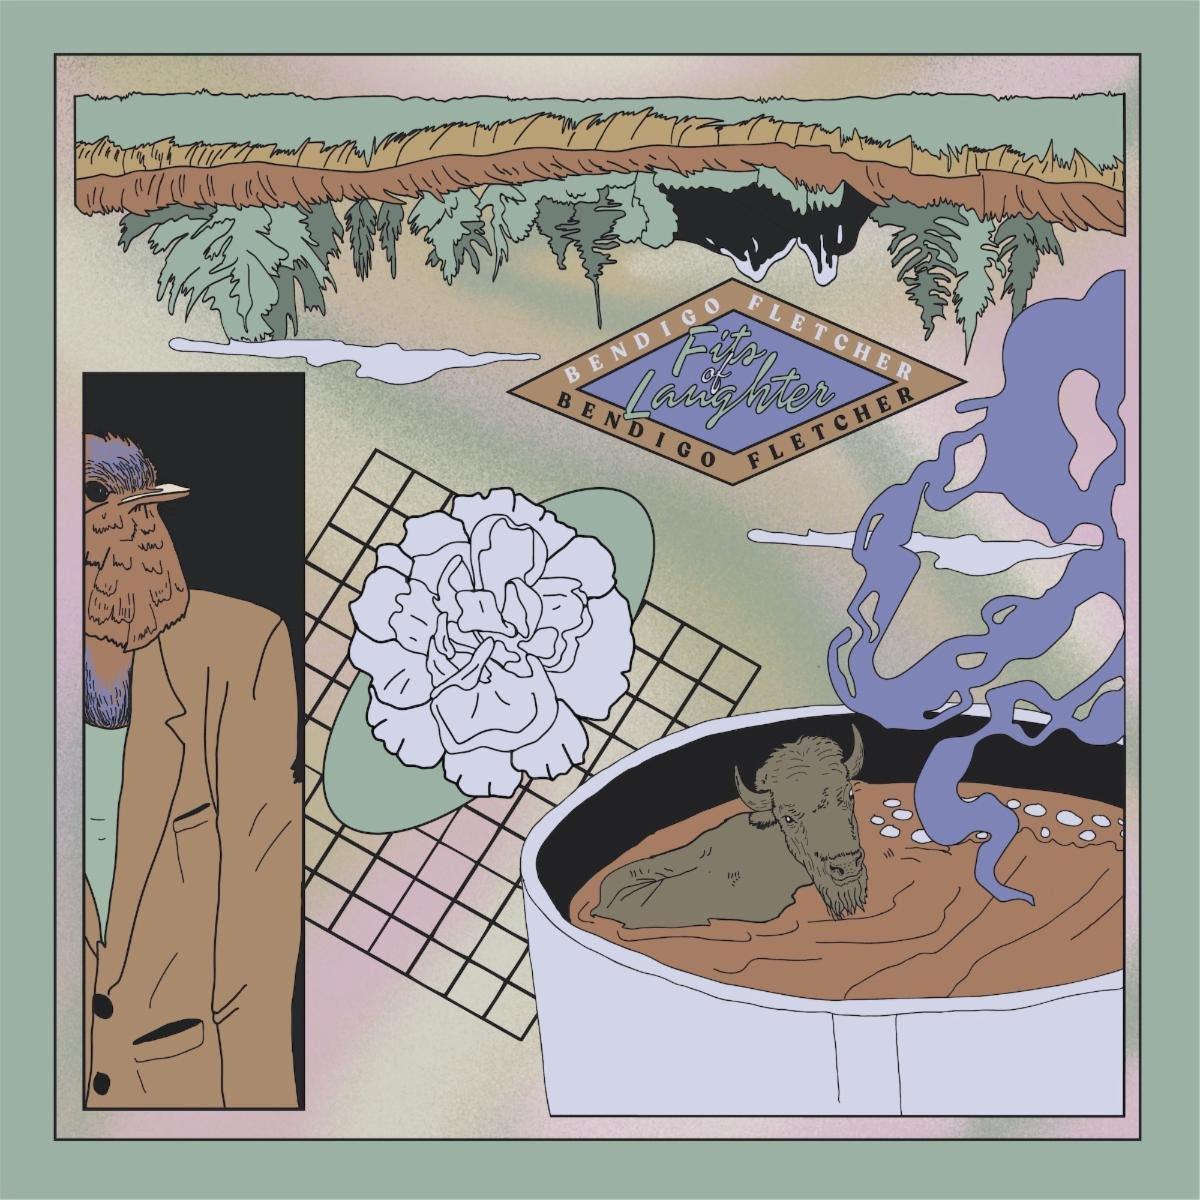 Bendigo Fletcher album artwork courtesy of Elektra Records for use by 360 MAGAZINE